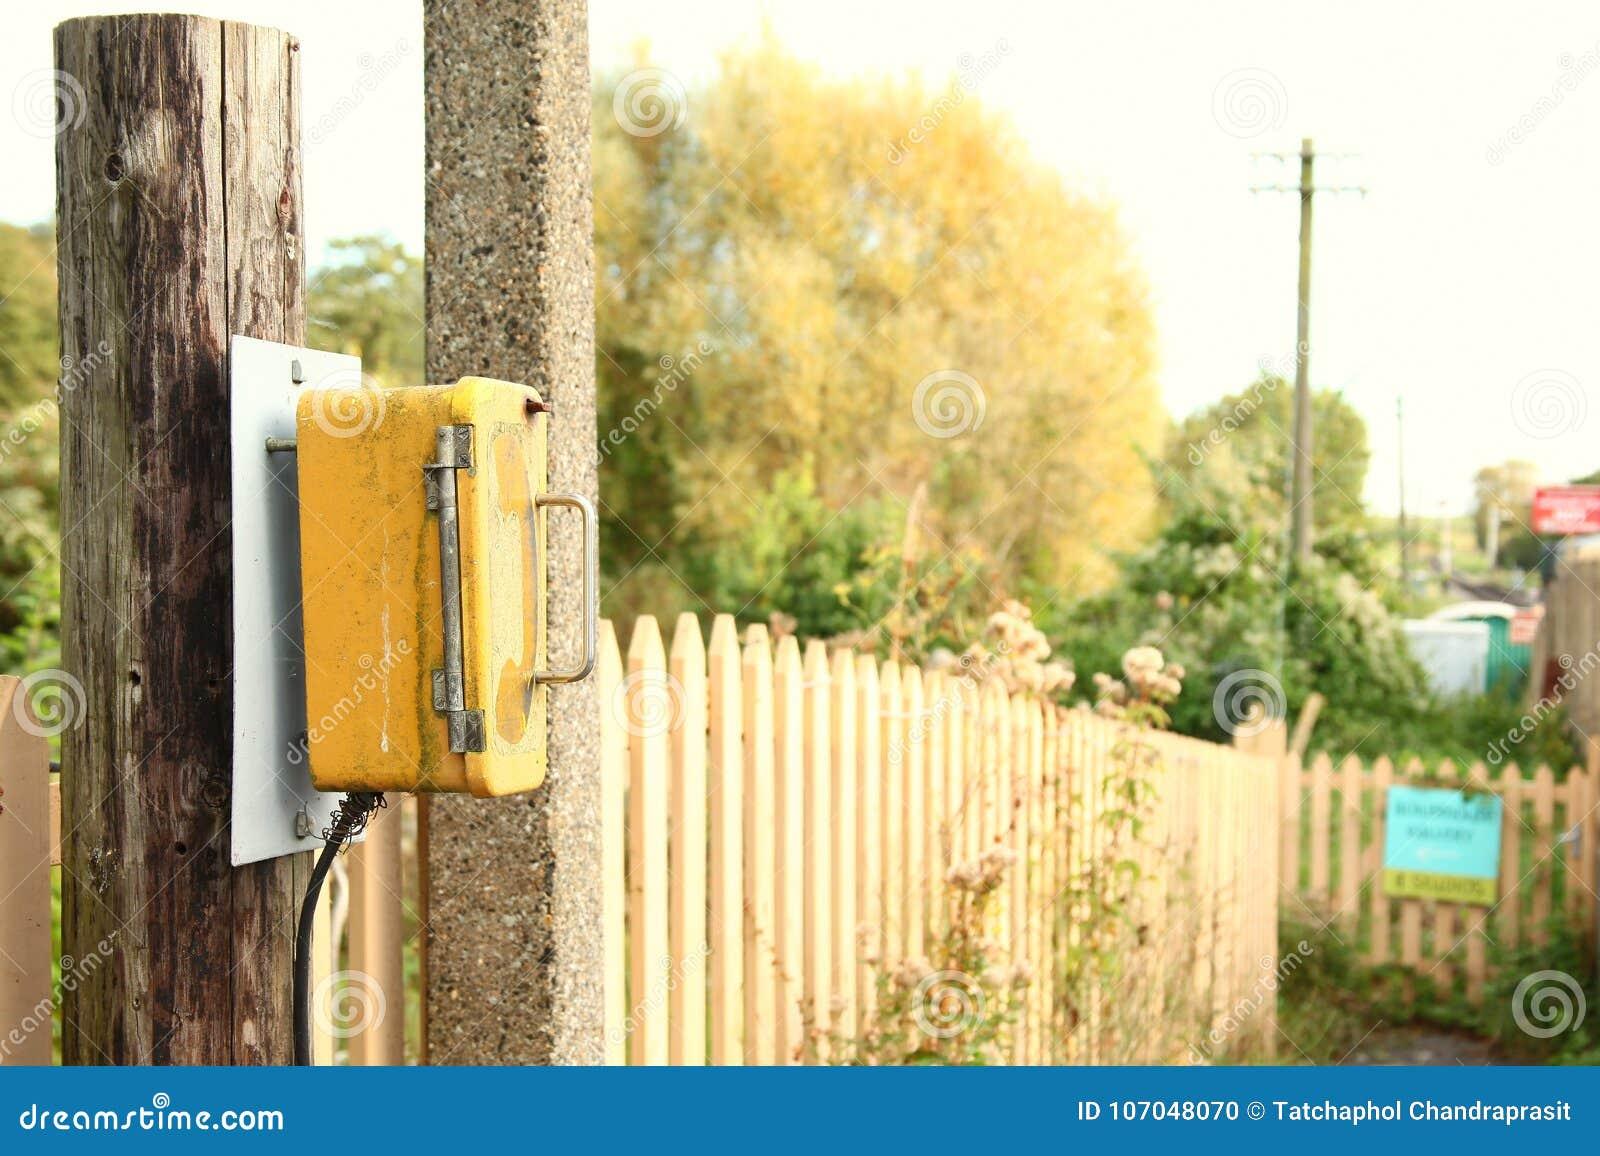 Telephone call box scene  stock photo  Image of communication